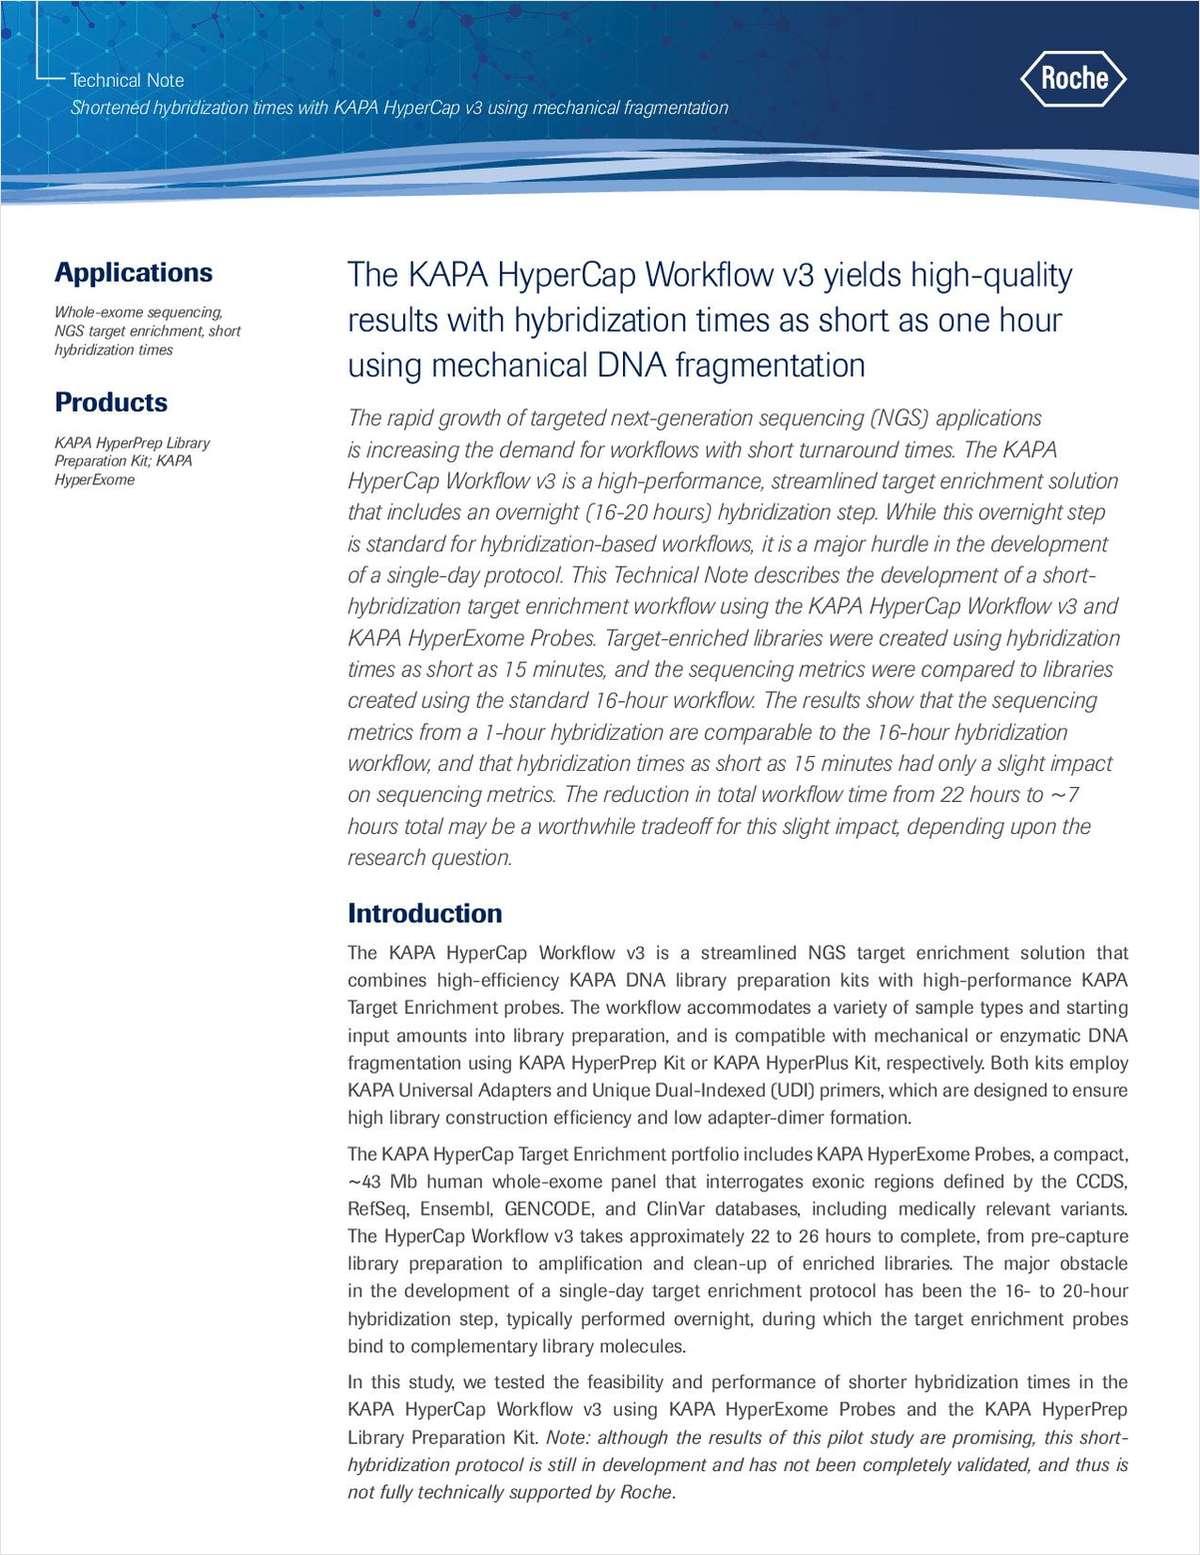 Shortened Hybridization Times with KAPA HyperCap v3 Using Mechanical Fragmentation